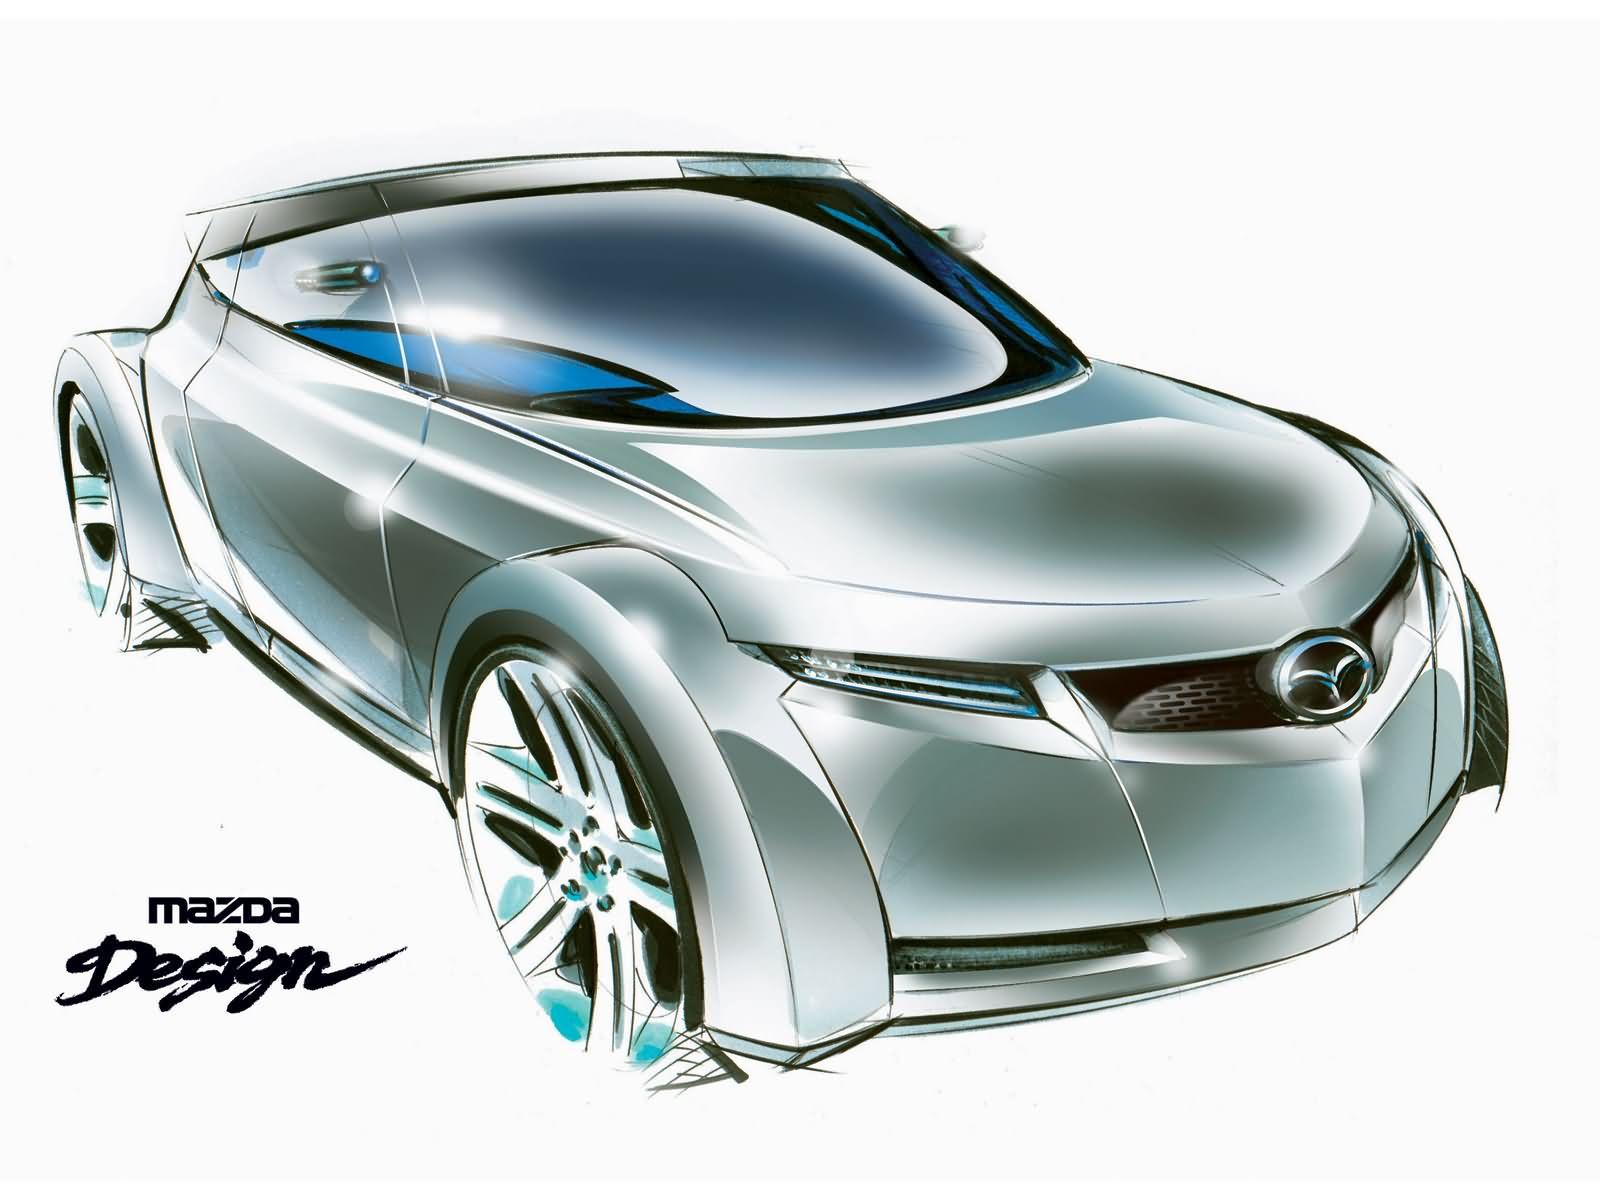 Furai Mazda Mazda Furai Gta5 Mods Com Mazda Furai Gta5